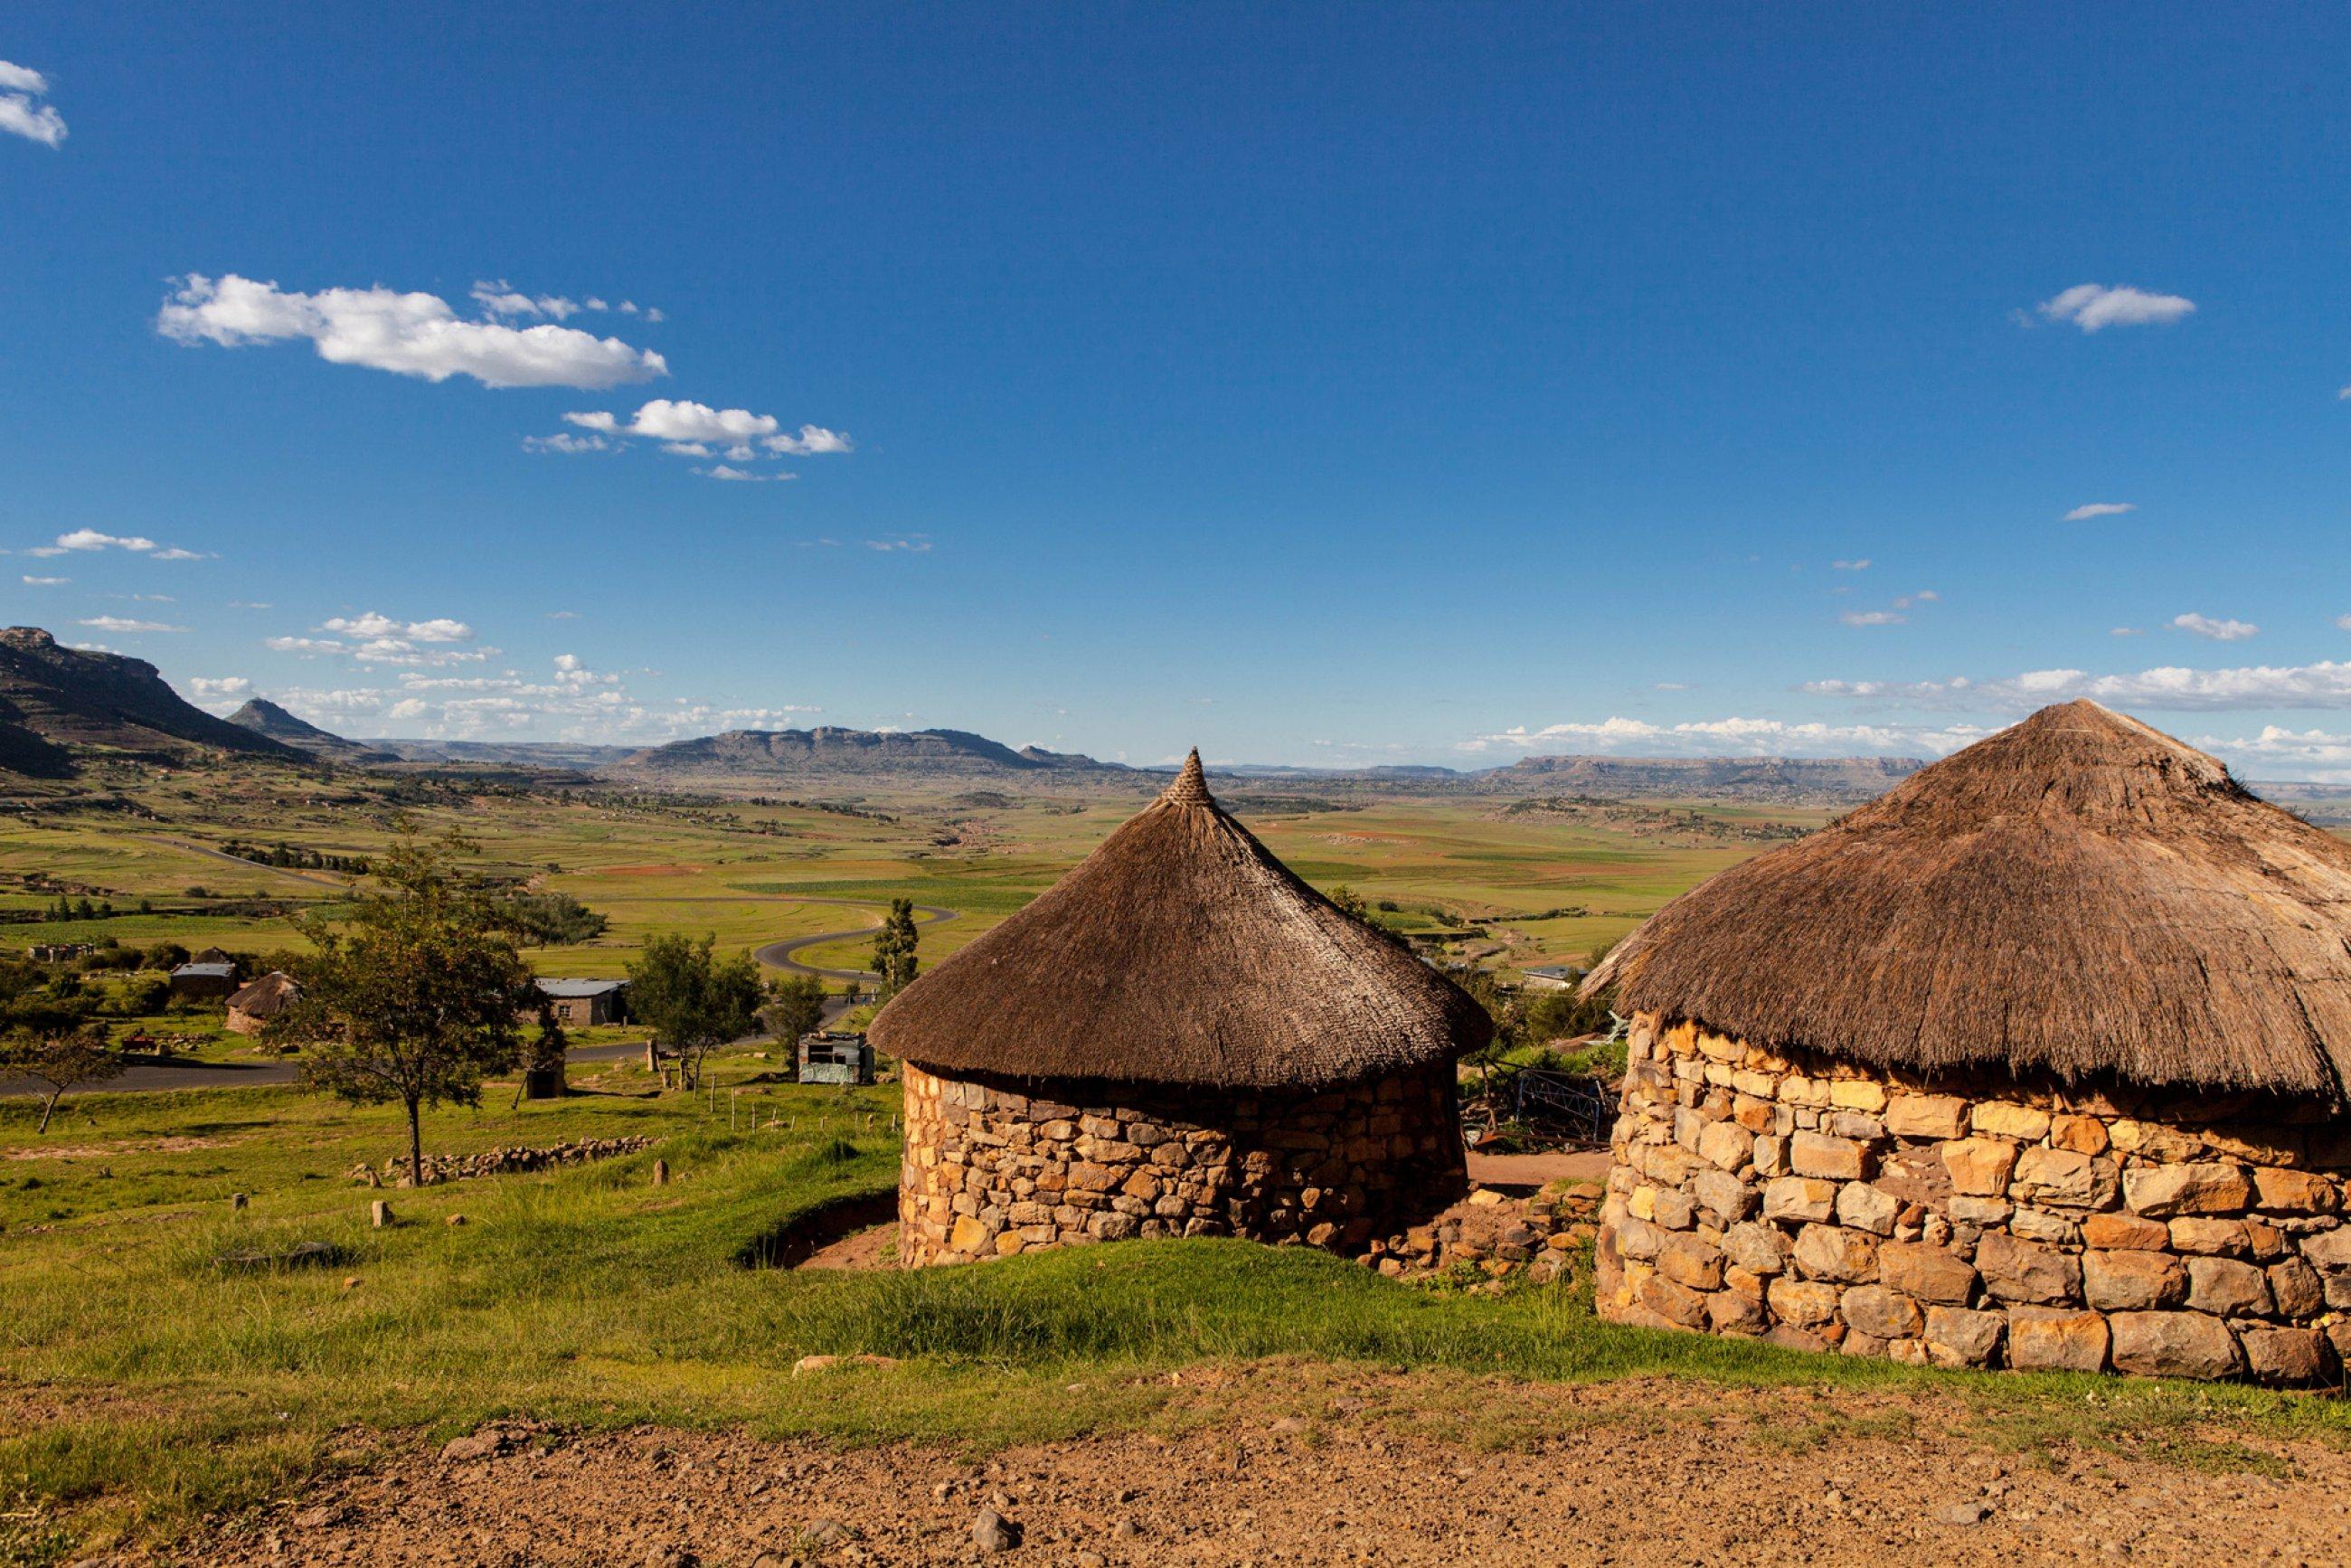 https://bubo.sk/uploads/galleries/7526/lesotho-lesotho-traditional-house-basotho-hut.jpg